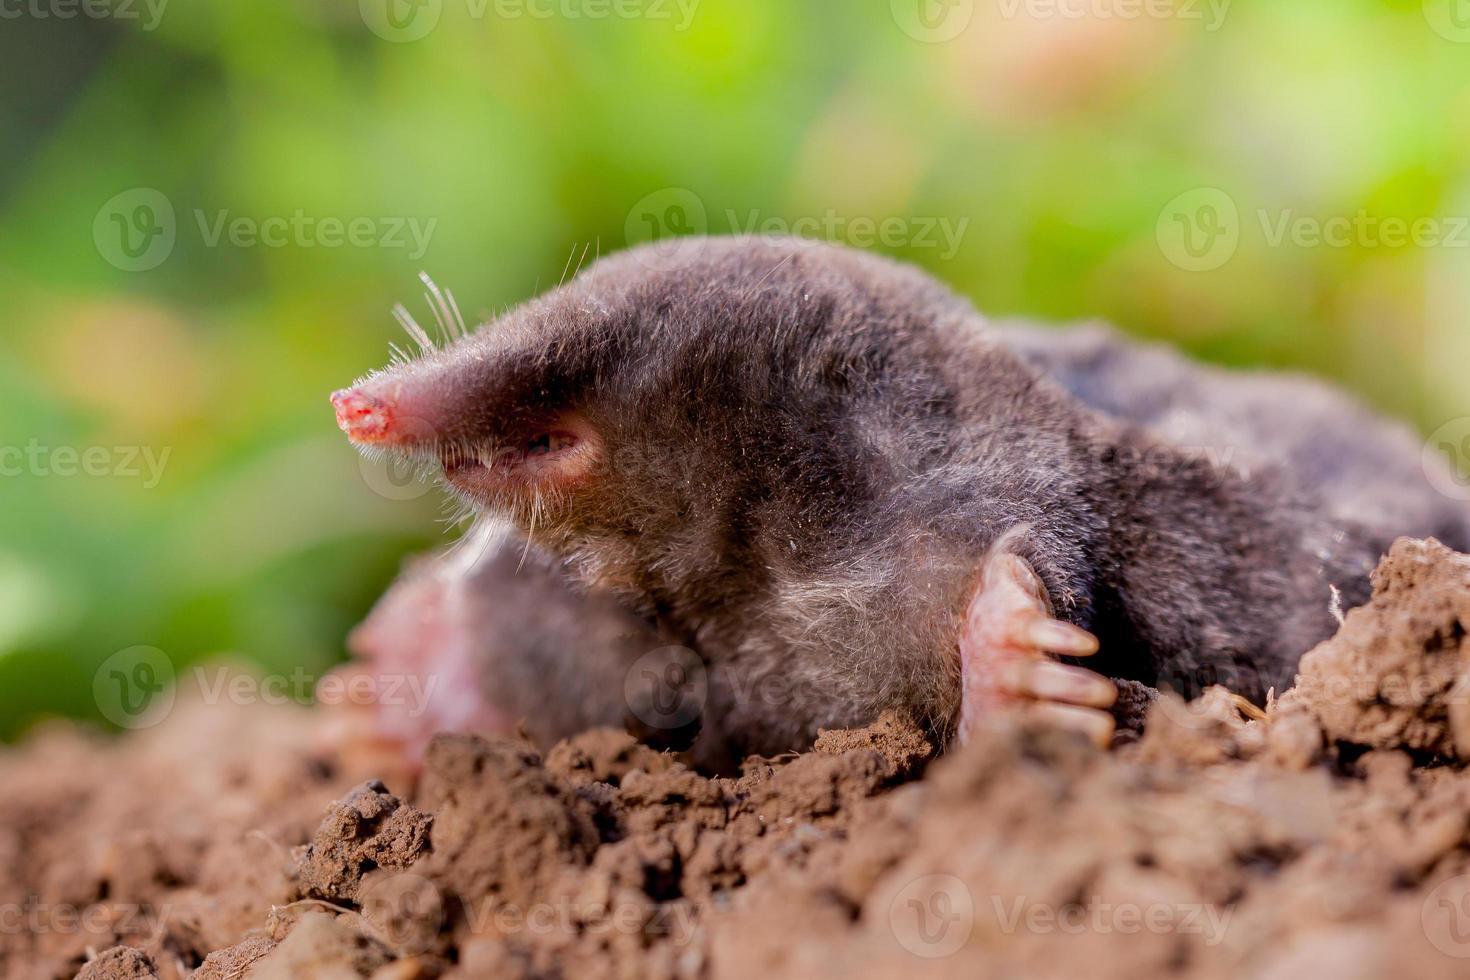 Mole (Talpa europaea) in Natural Environment photo